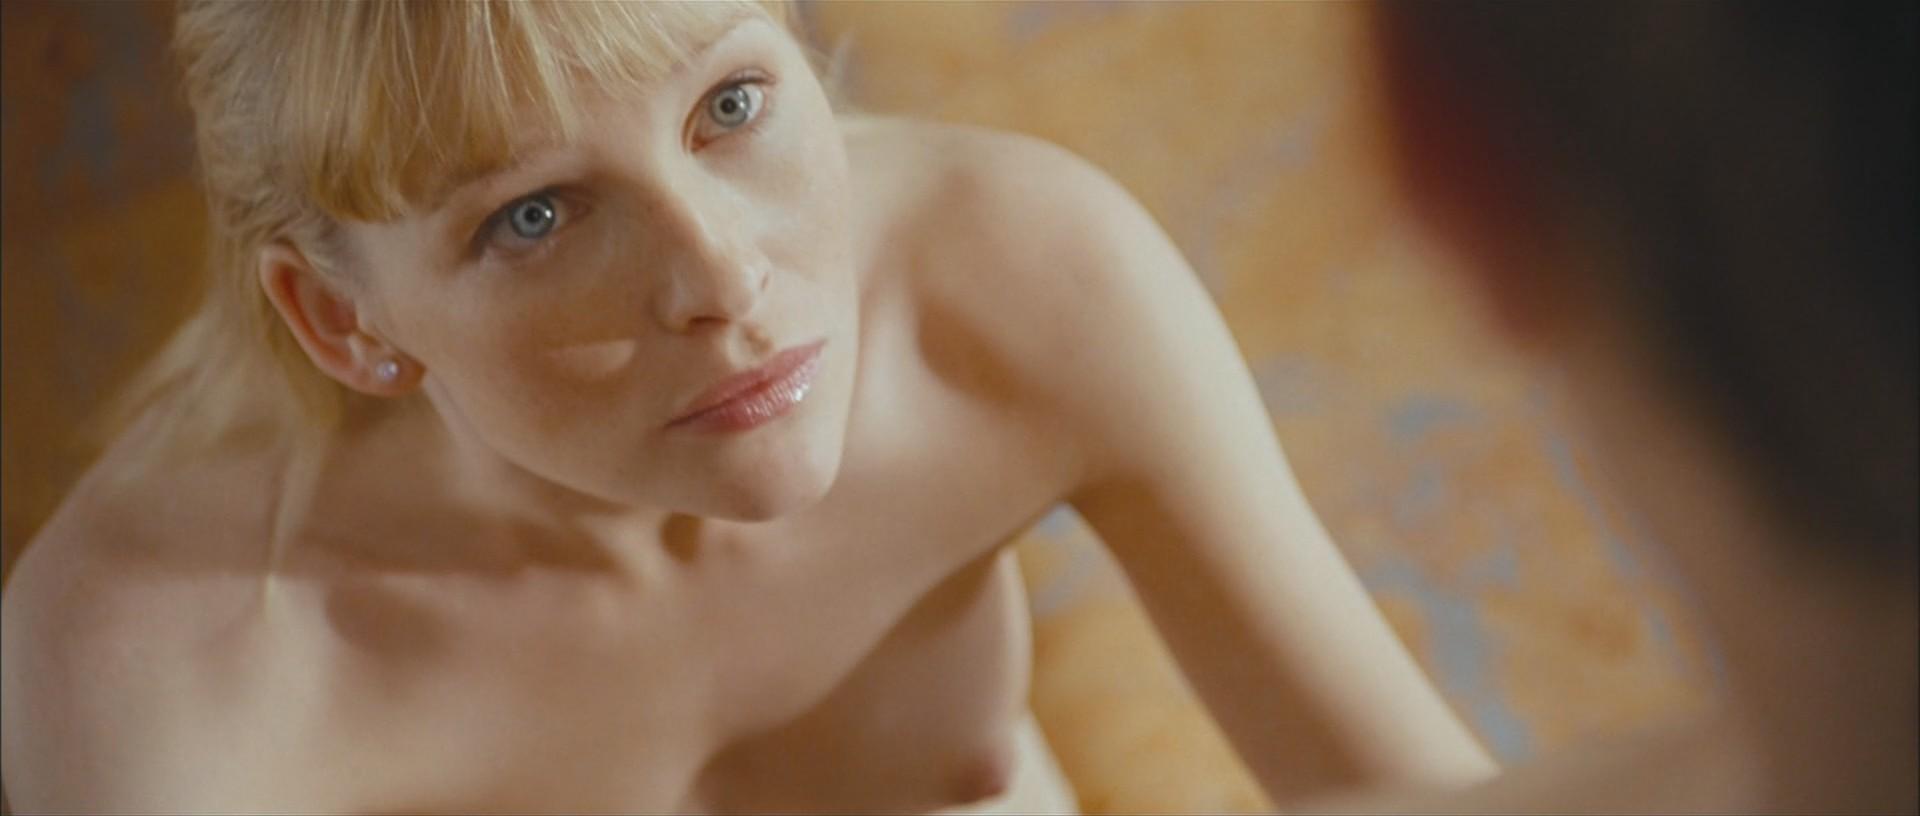 Love actually movie nud